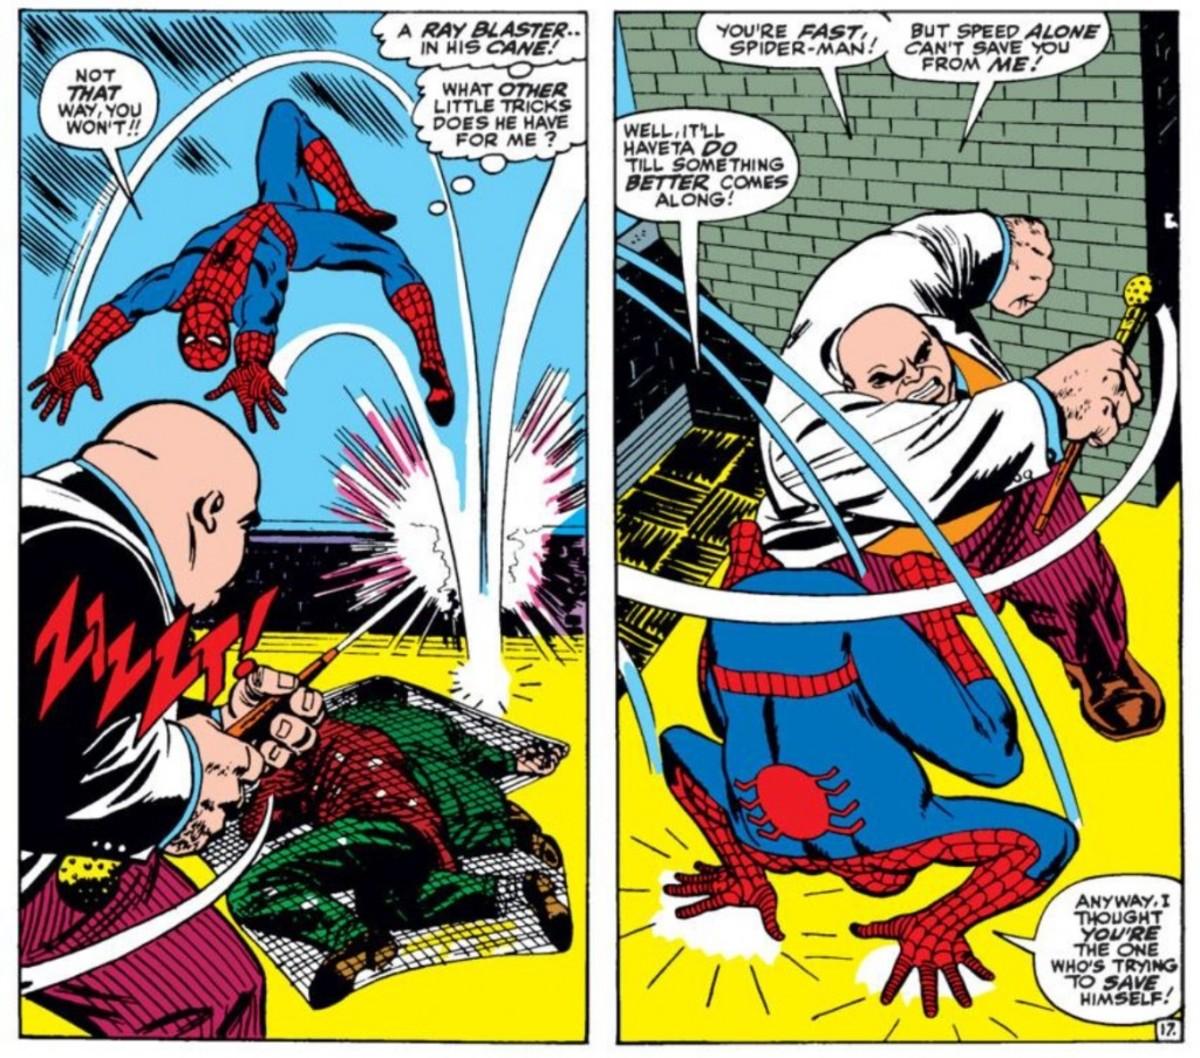 spiderman-on-the-intellivision-amico